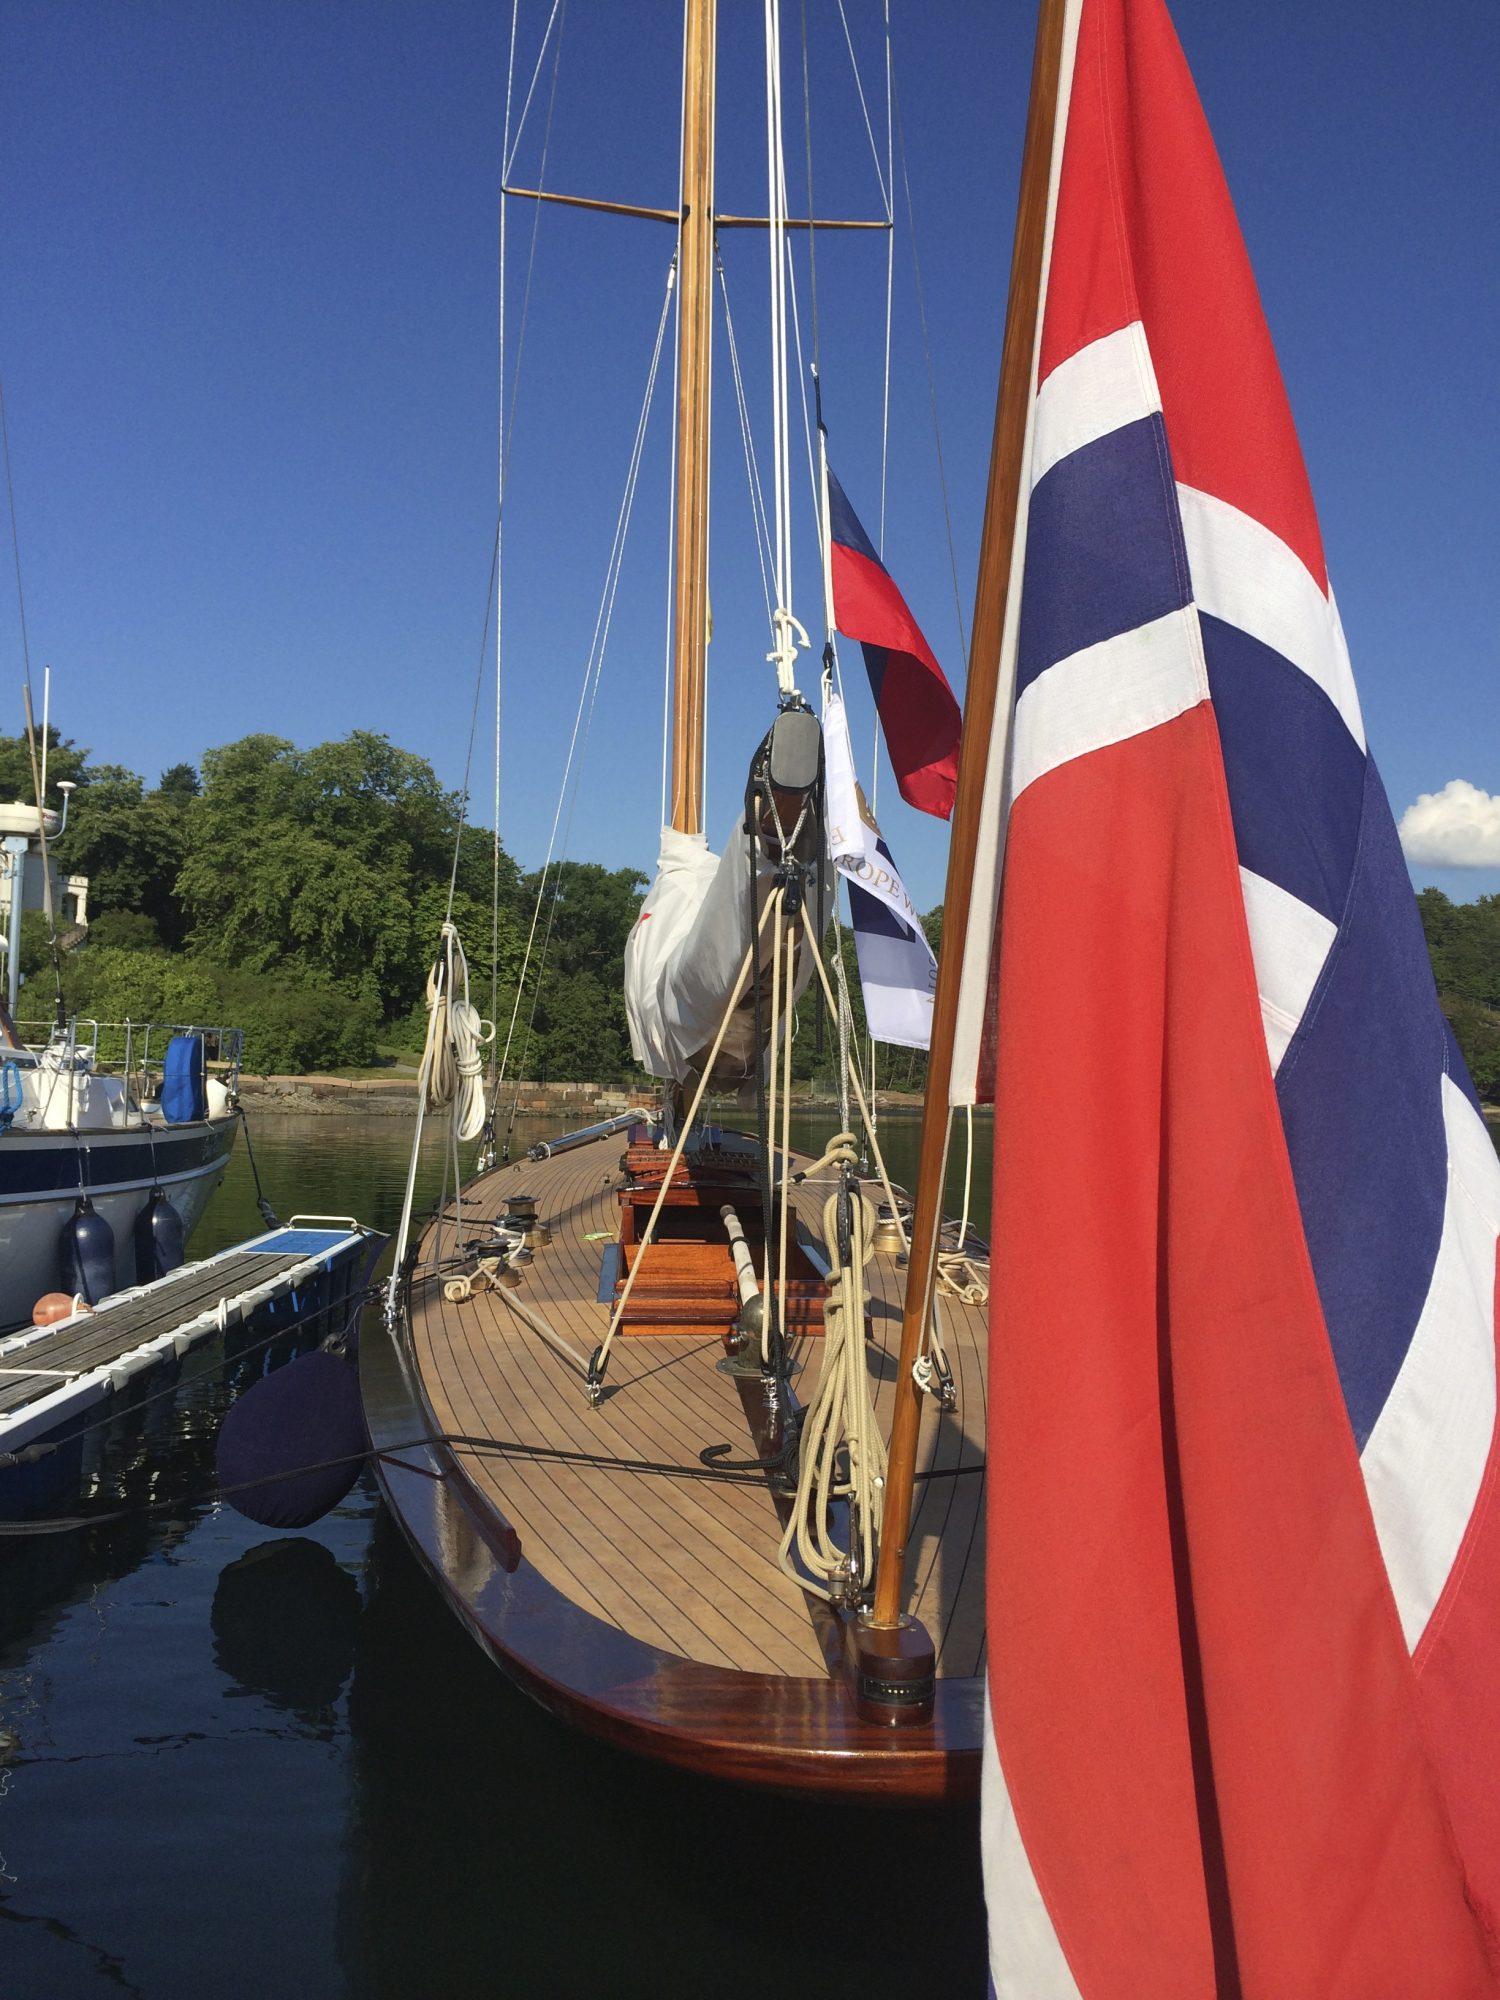 Møt Jotuns representanter i forbindelse med Hurum Trebåtfestival 3. juni